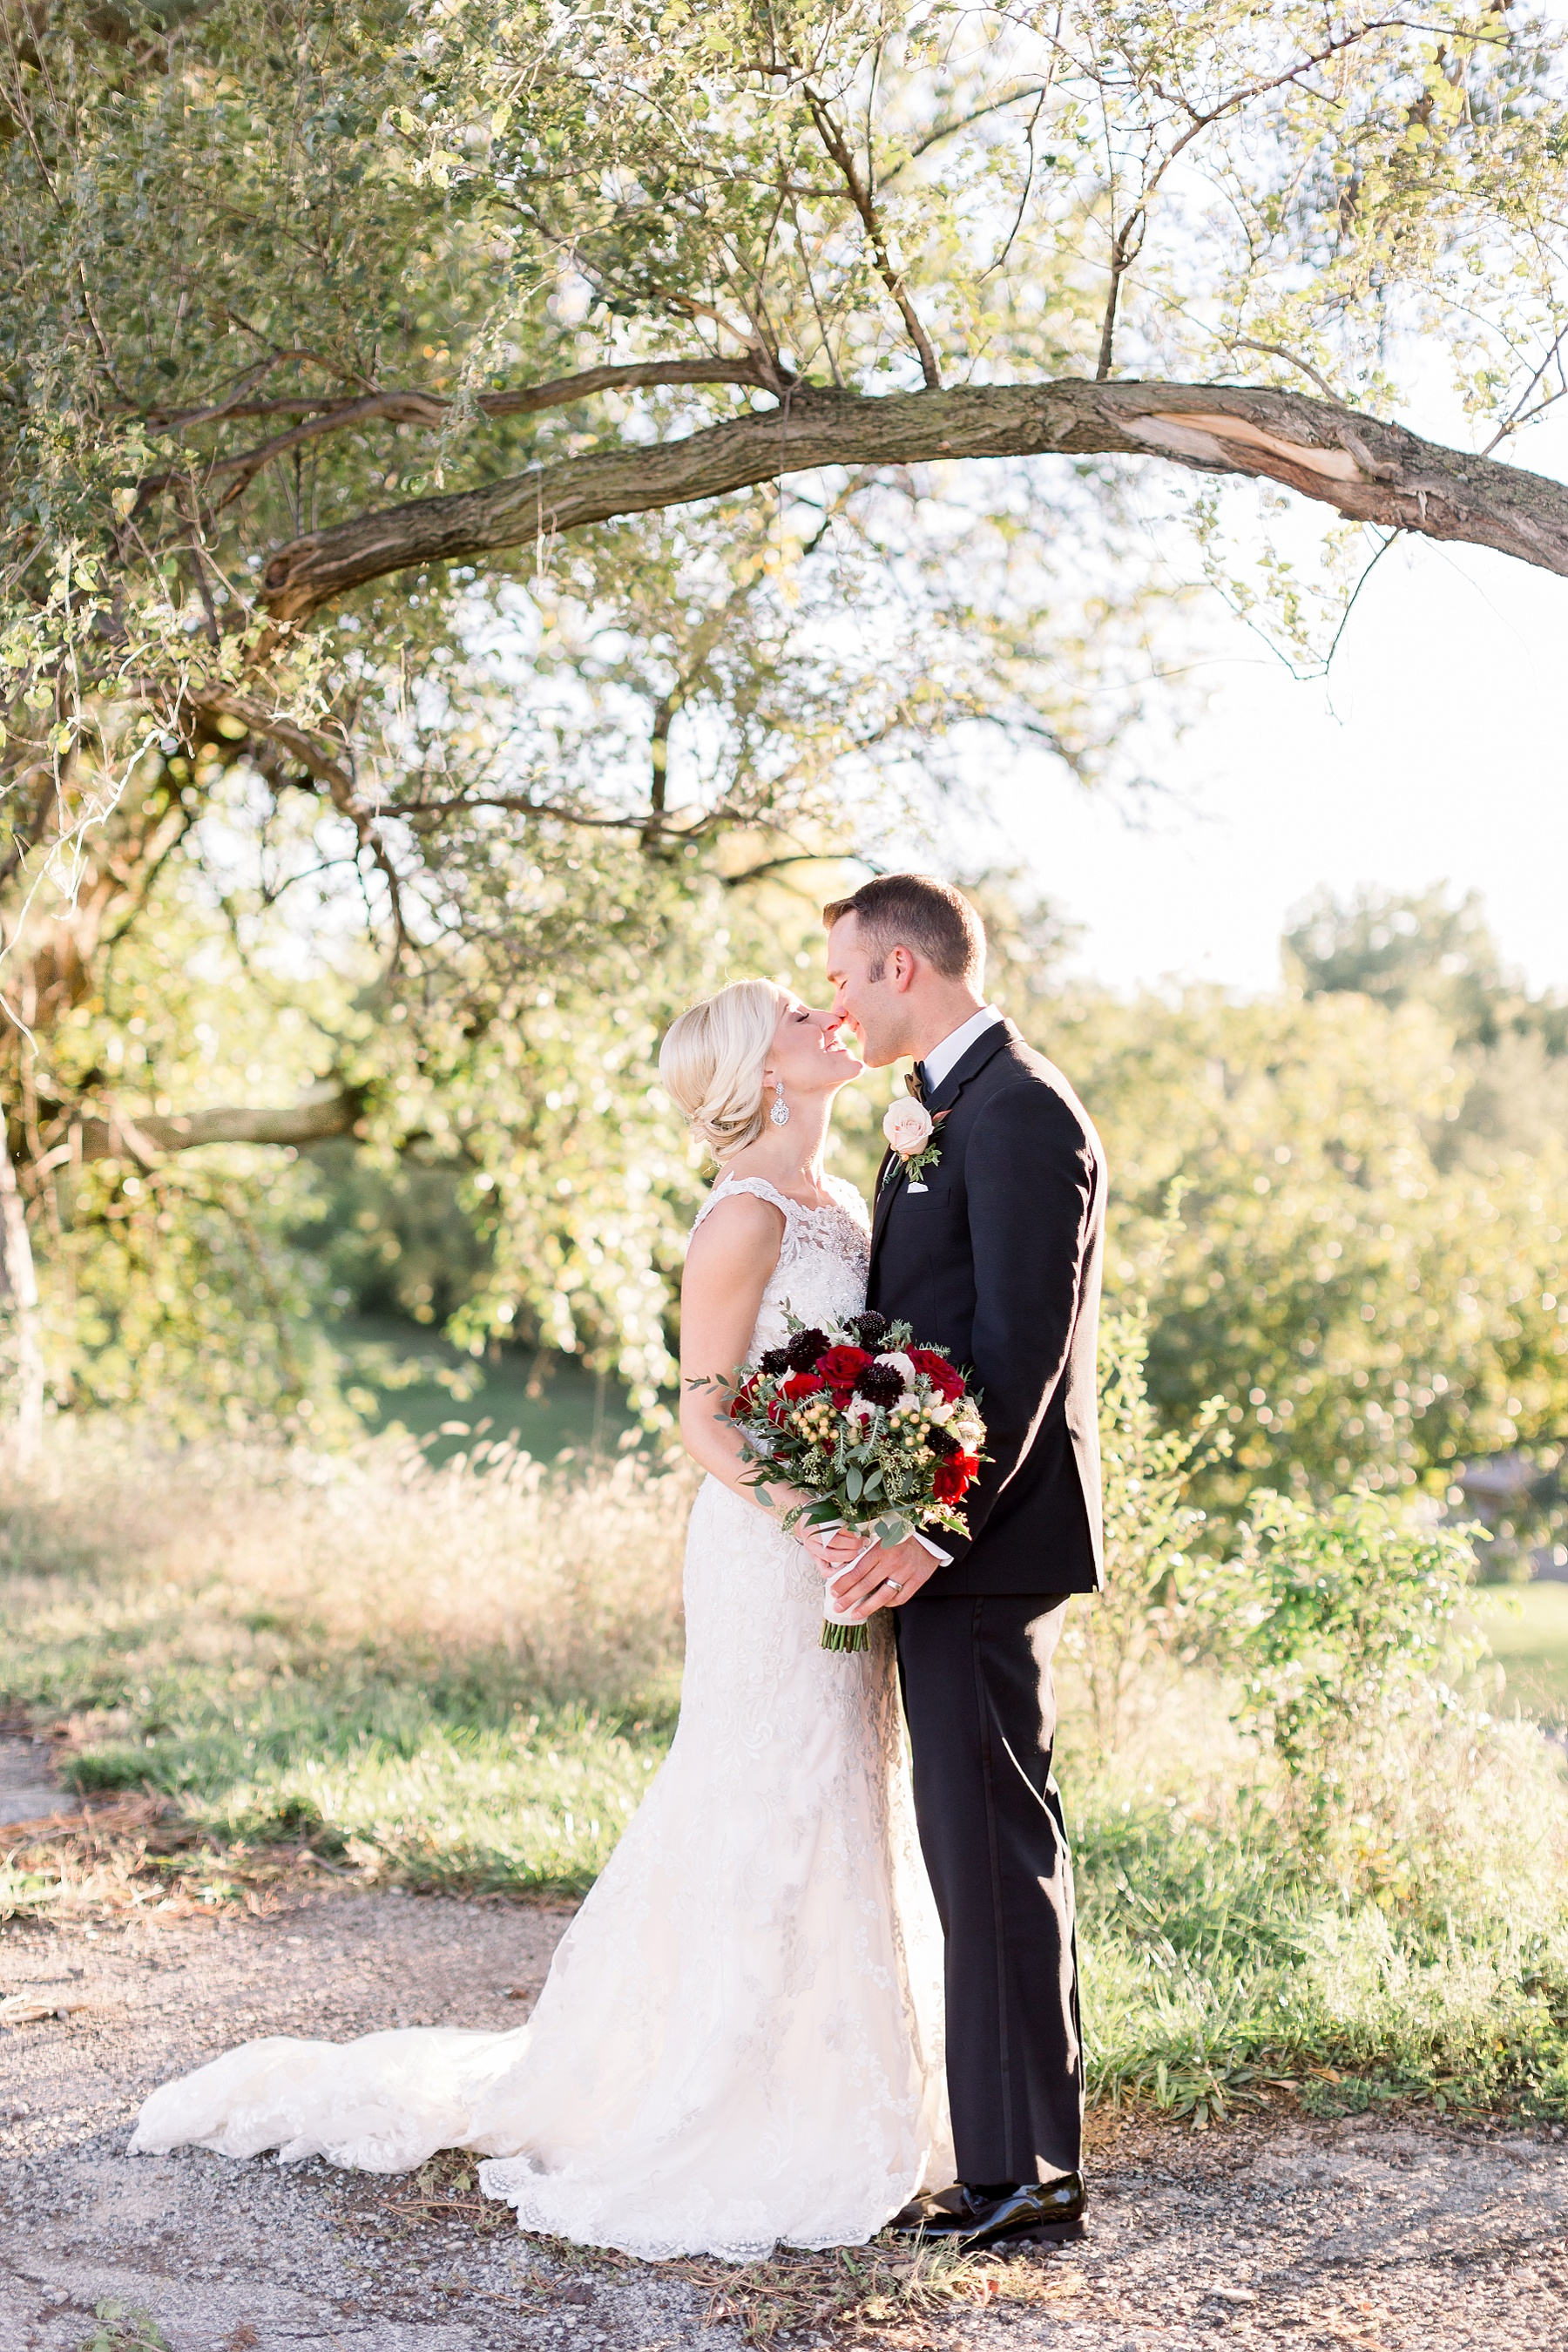 midwest-adventurous-wedding-photographer-elizabeth-ladean-photography-photo_4805.jpg